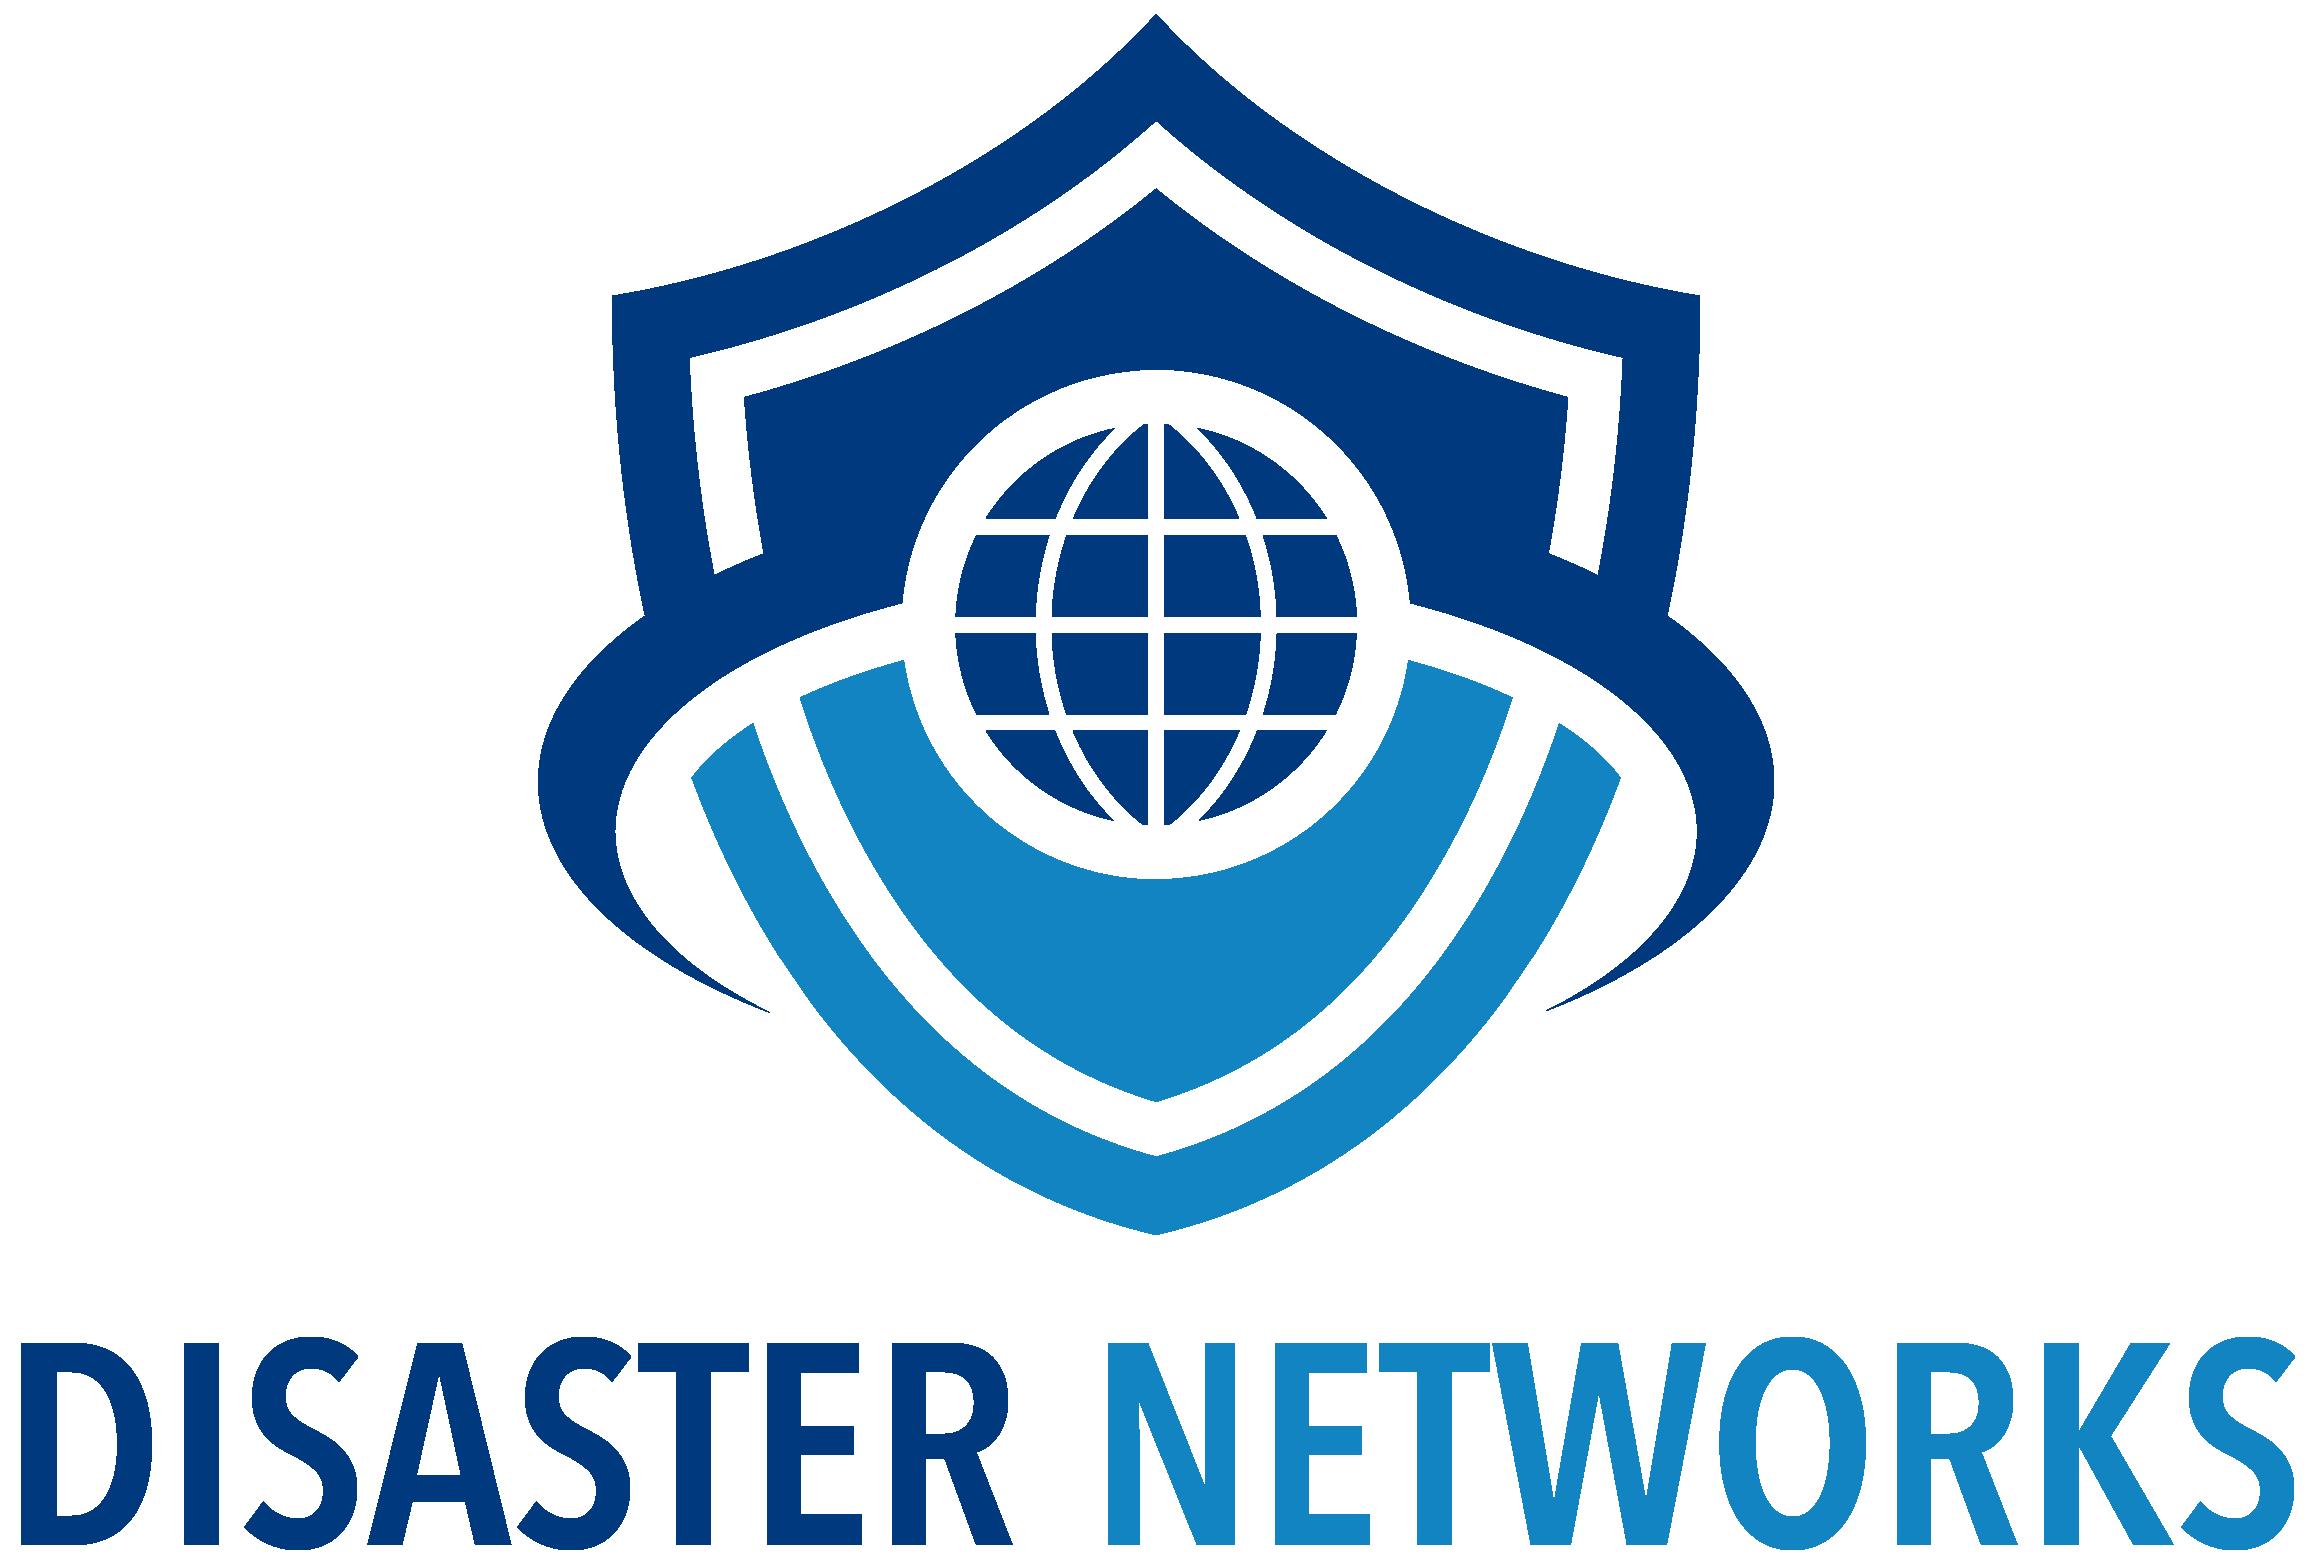 Disaster Networks